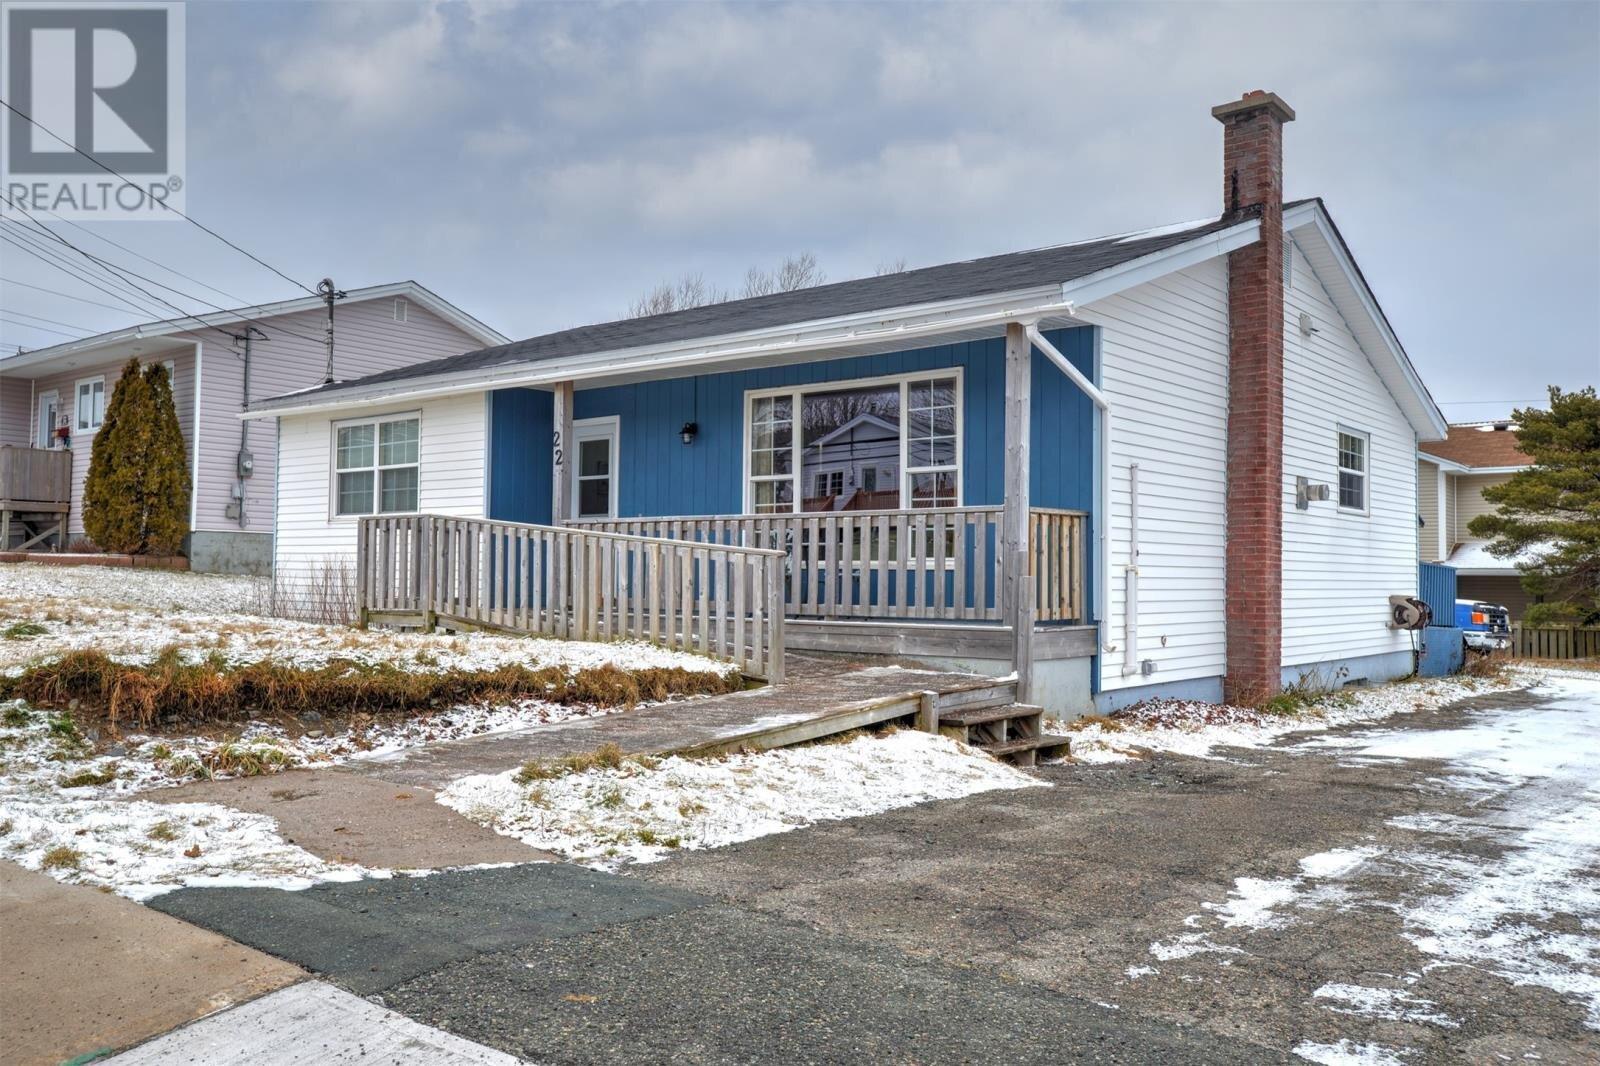 House for sale at 22 Murphys Ln St. John's Newfoundland - MLS: 1224748